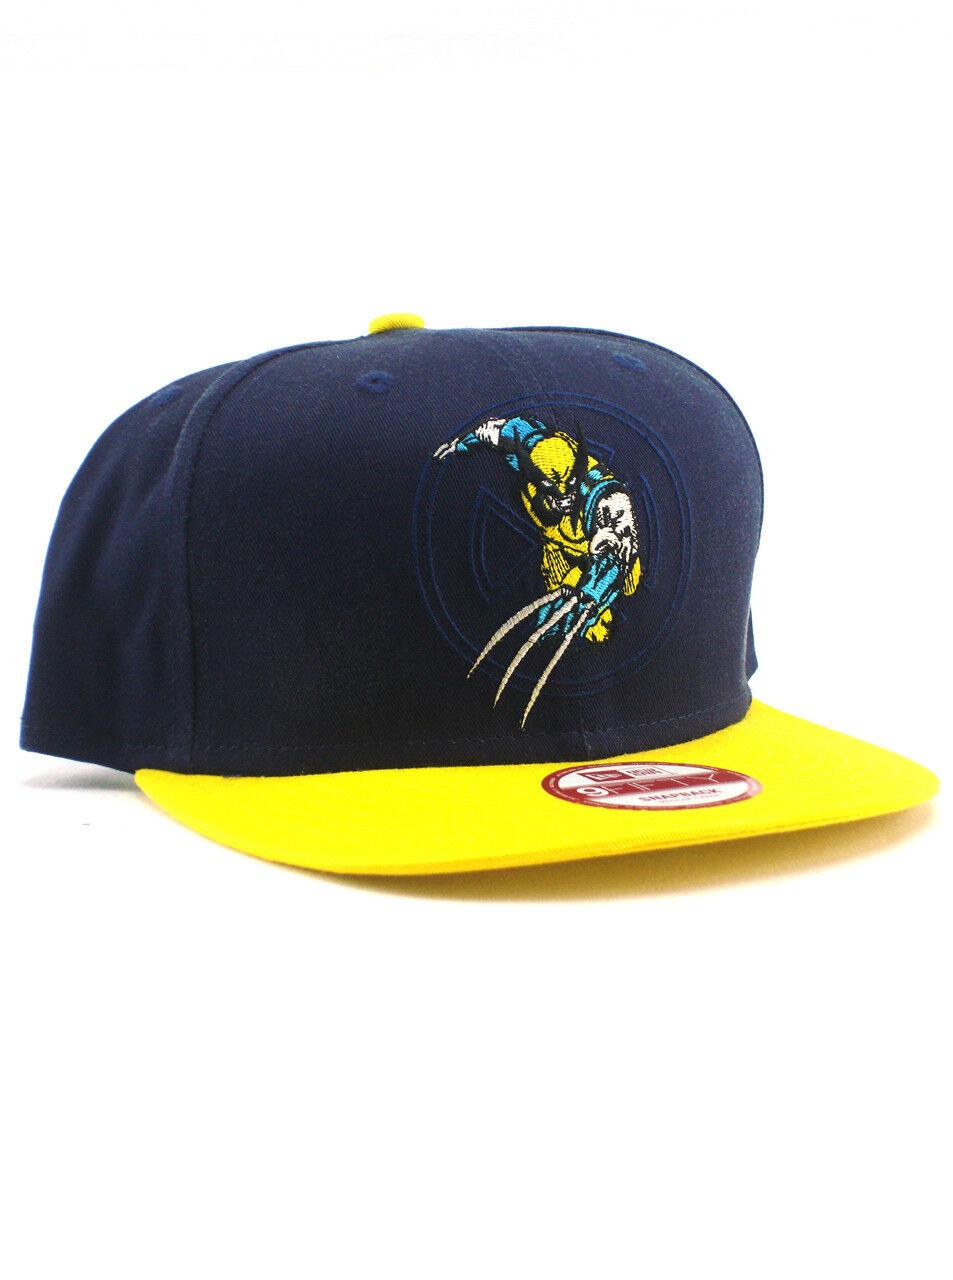 8675b81635d77 ... usa new era adjustable wolverine 9fifty snapback hat adjustable era cap  marvel comics logan x men ...